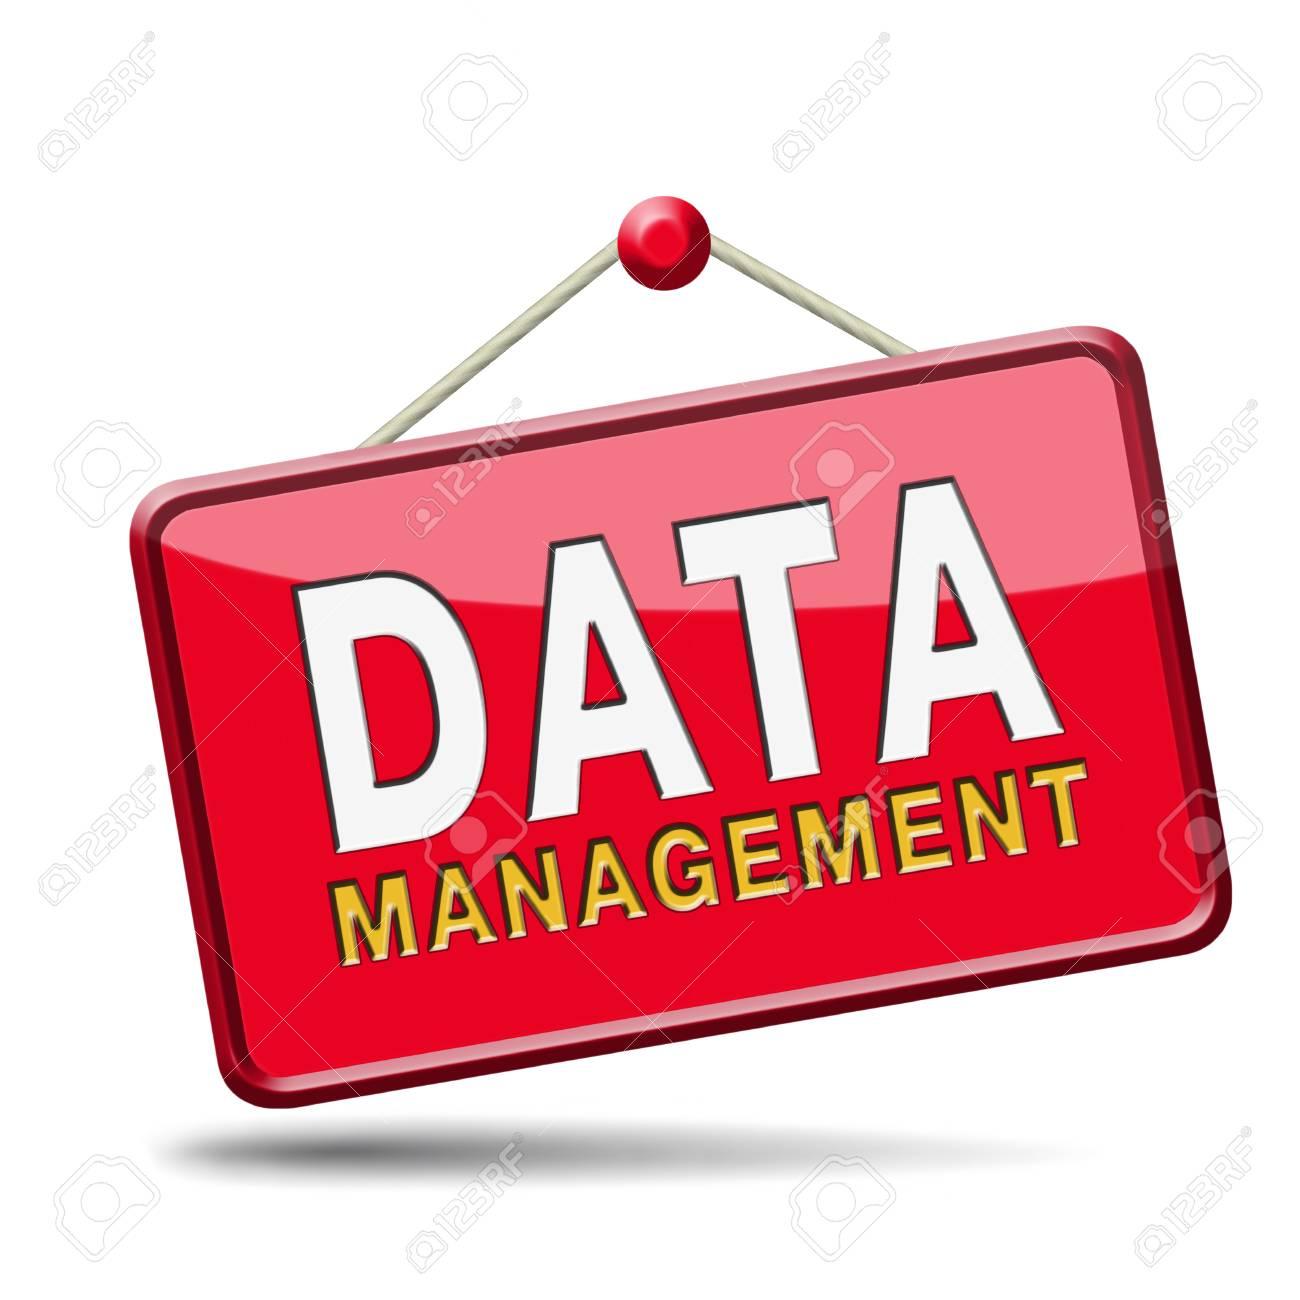 data management storage analysis and integration of big data Stock Photo - 22822182